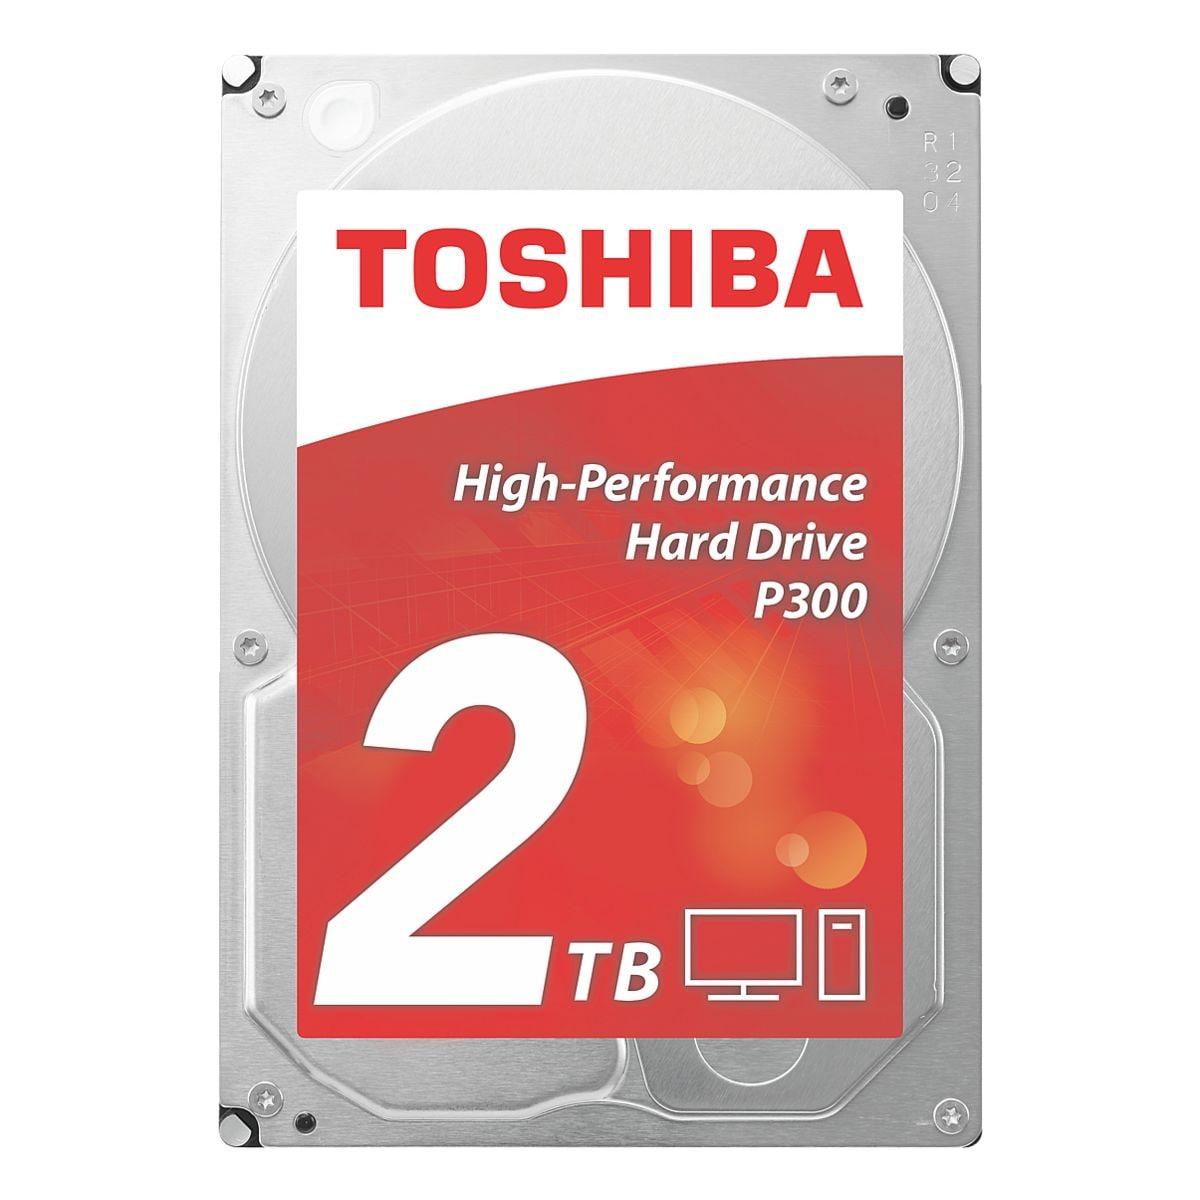 Toshiba disque dur interne 2 TB, disque dur interne HDD, 8,9 cm (3,5 pouces)